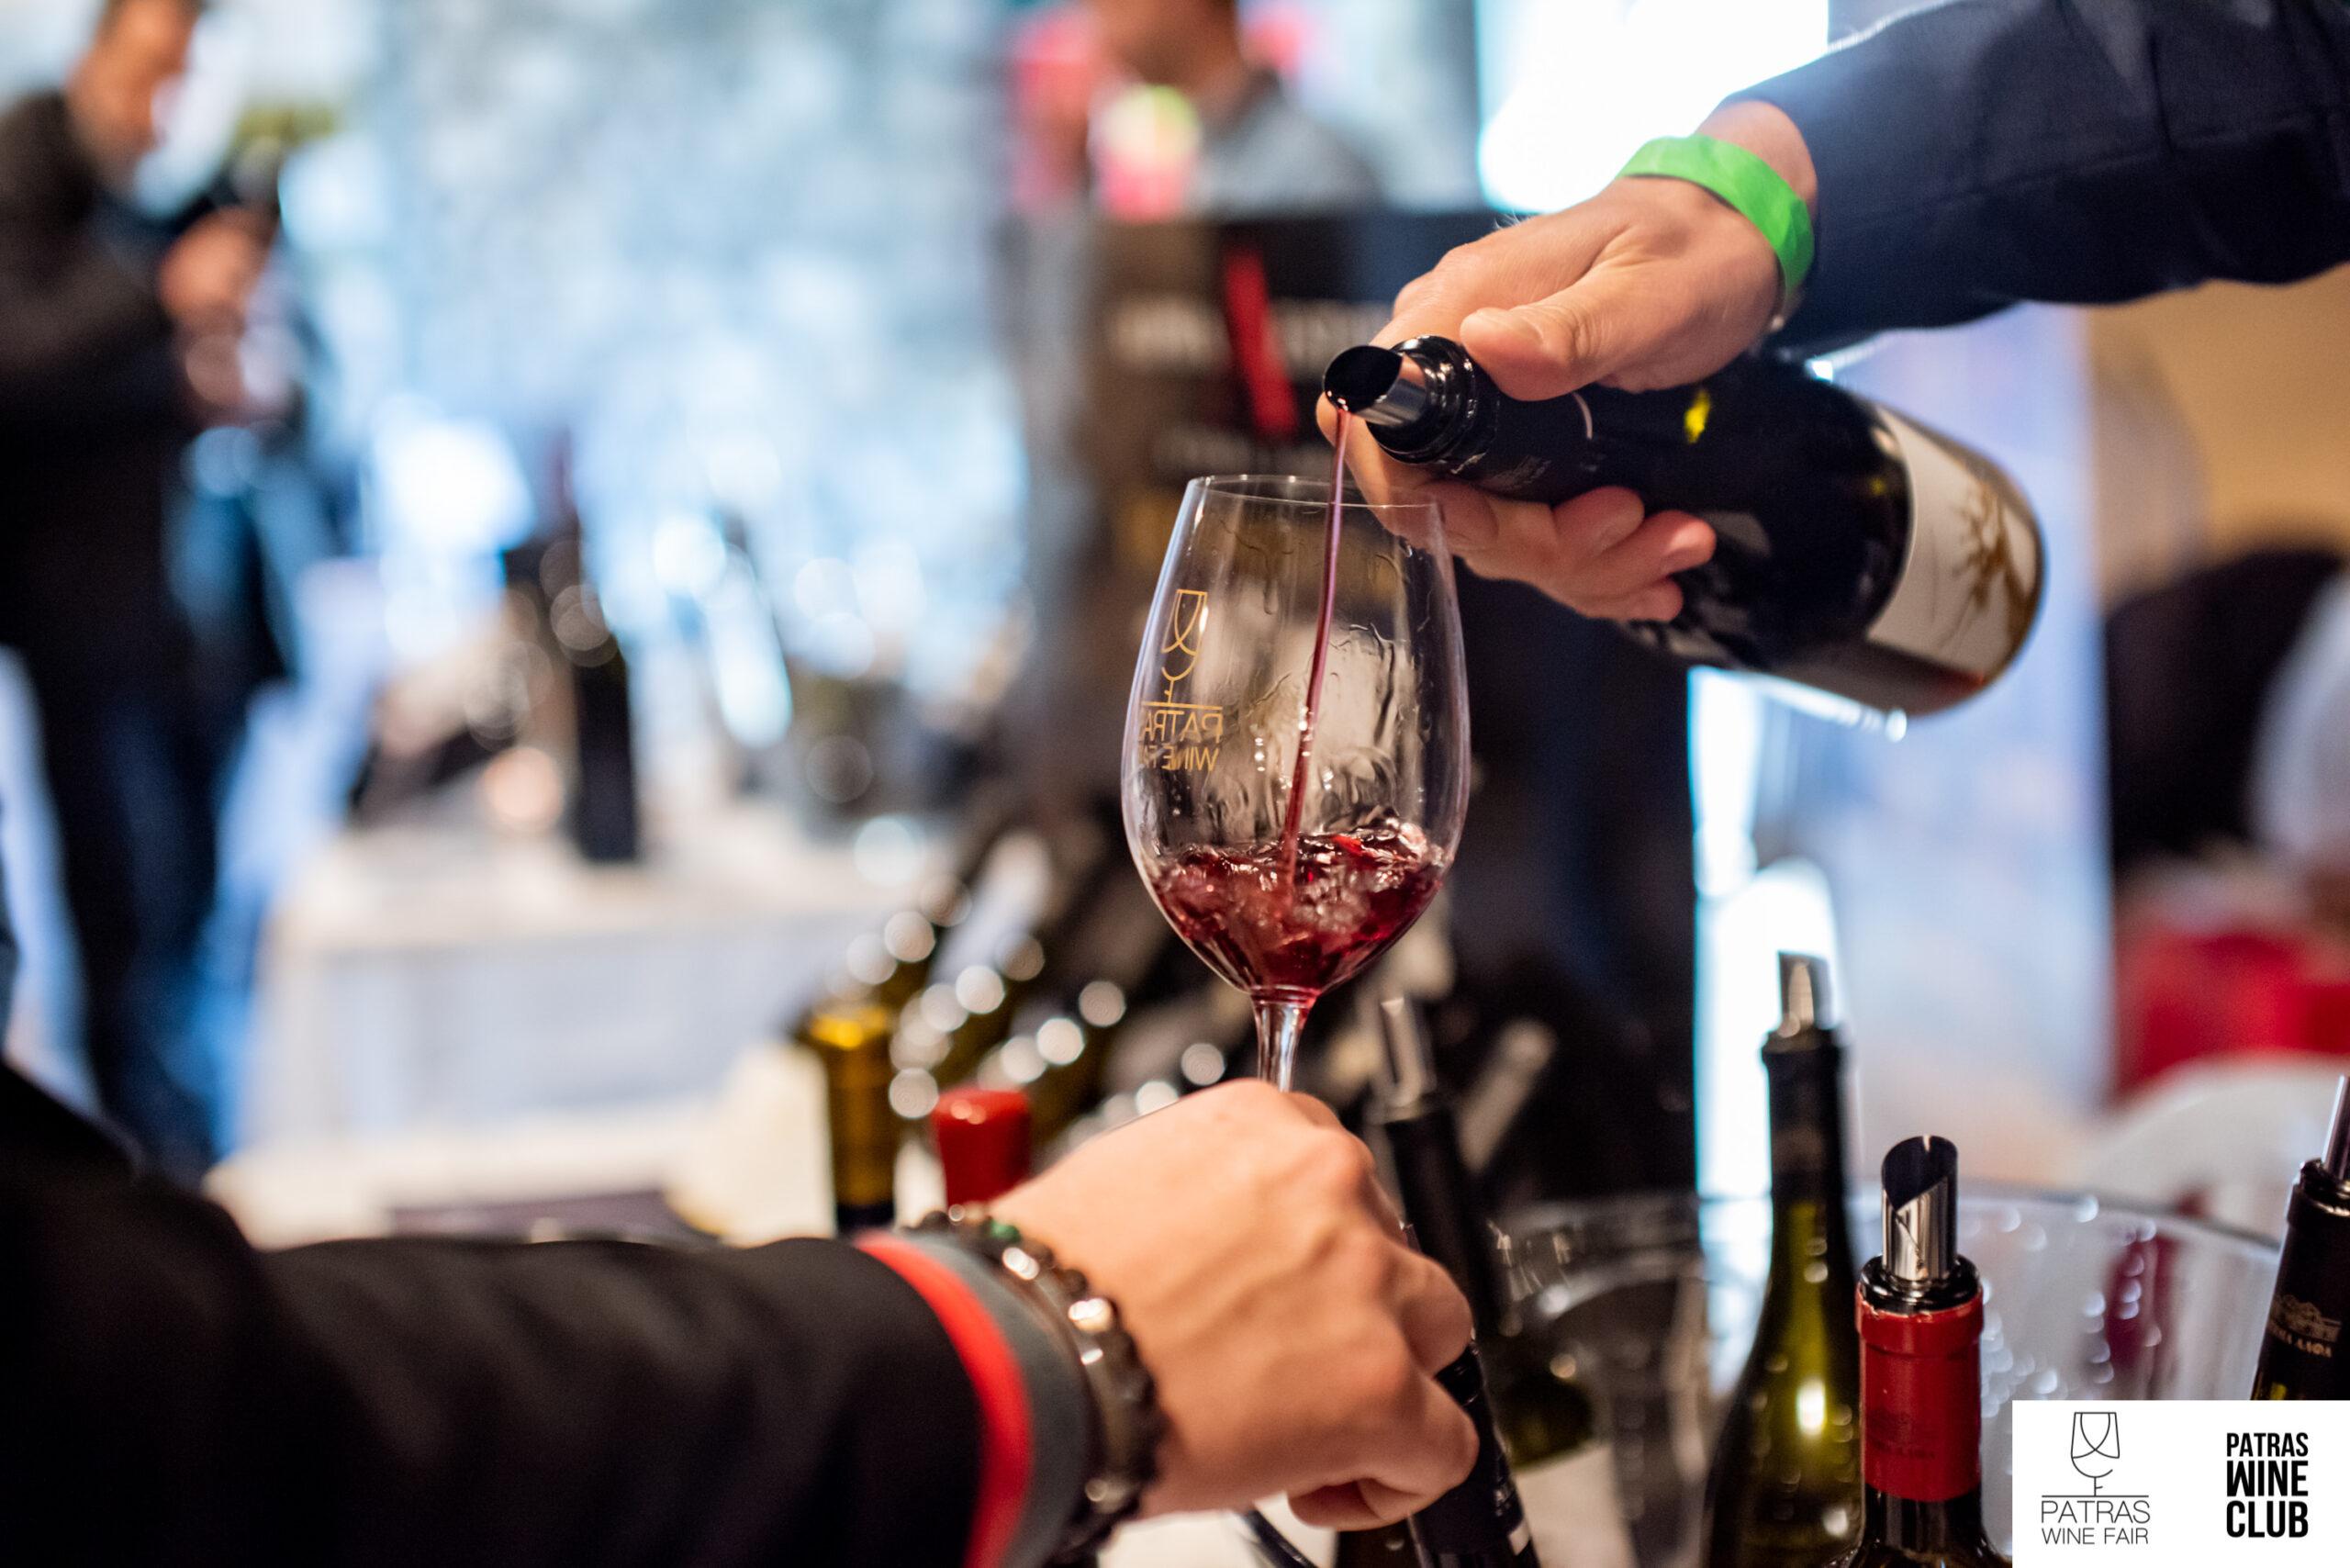 Patras Wine Fair